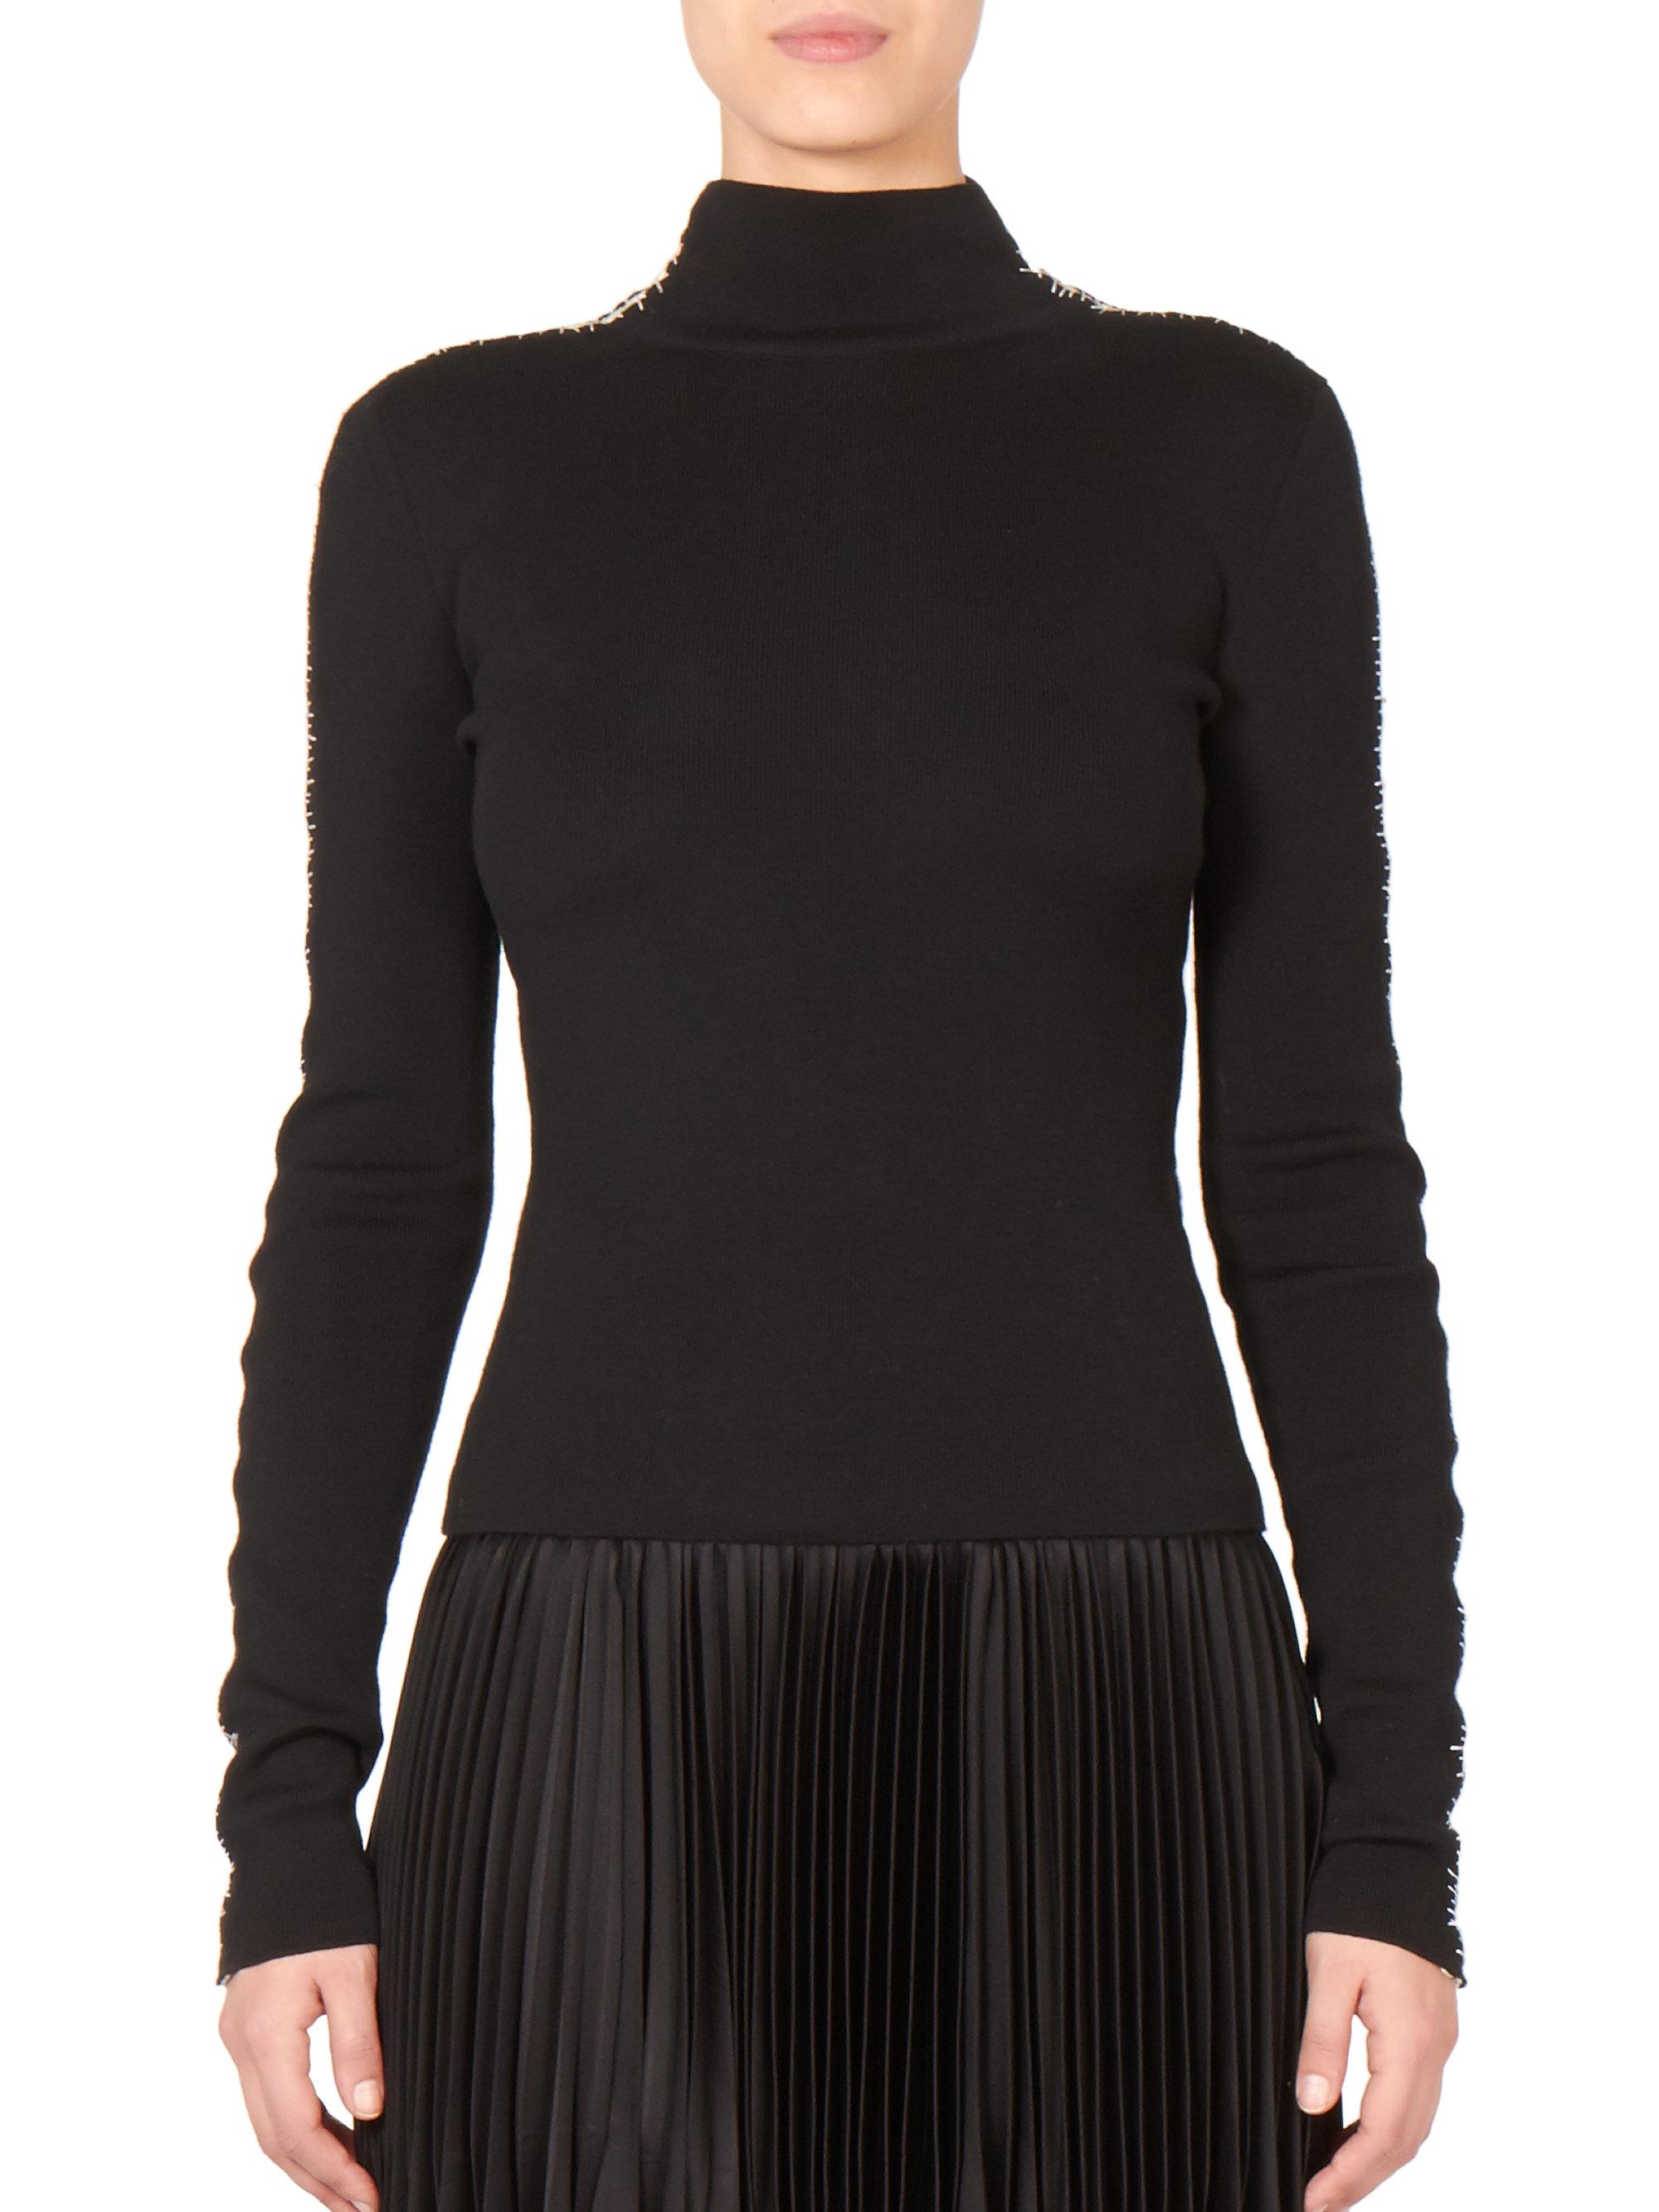 haider ackermann stitched turtleneck sweater in black lyst. Black Bedroom Furniture Sets. Home Design Ideas